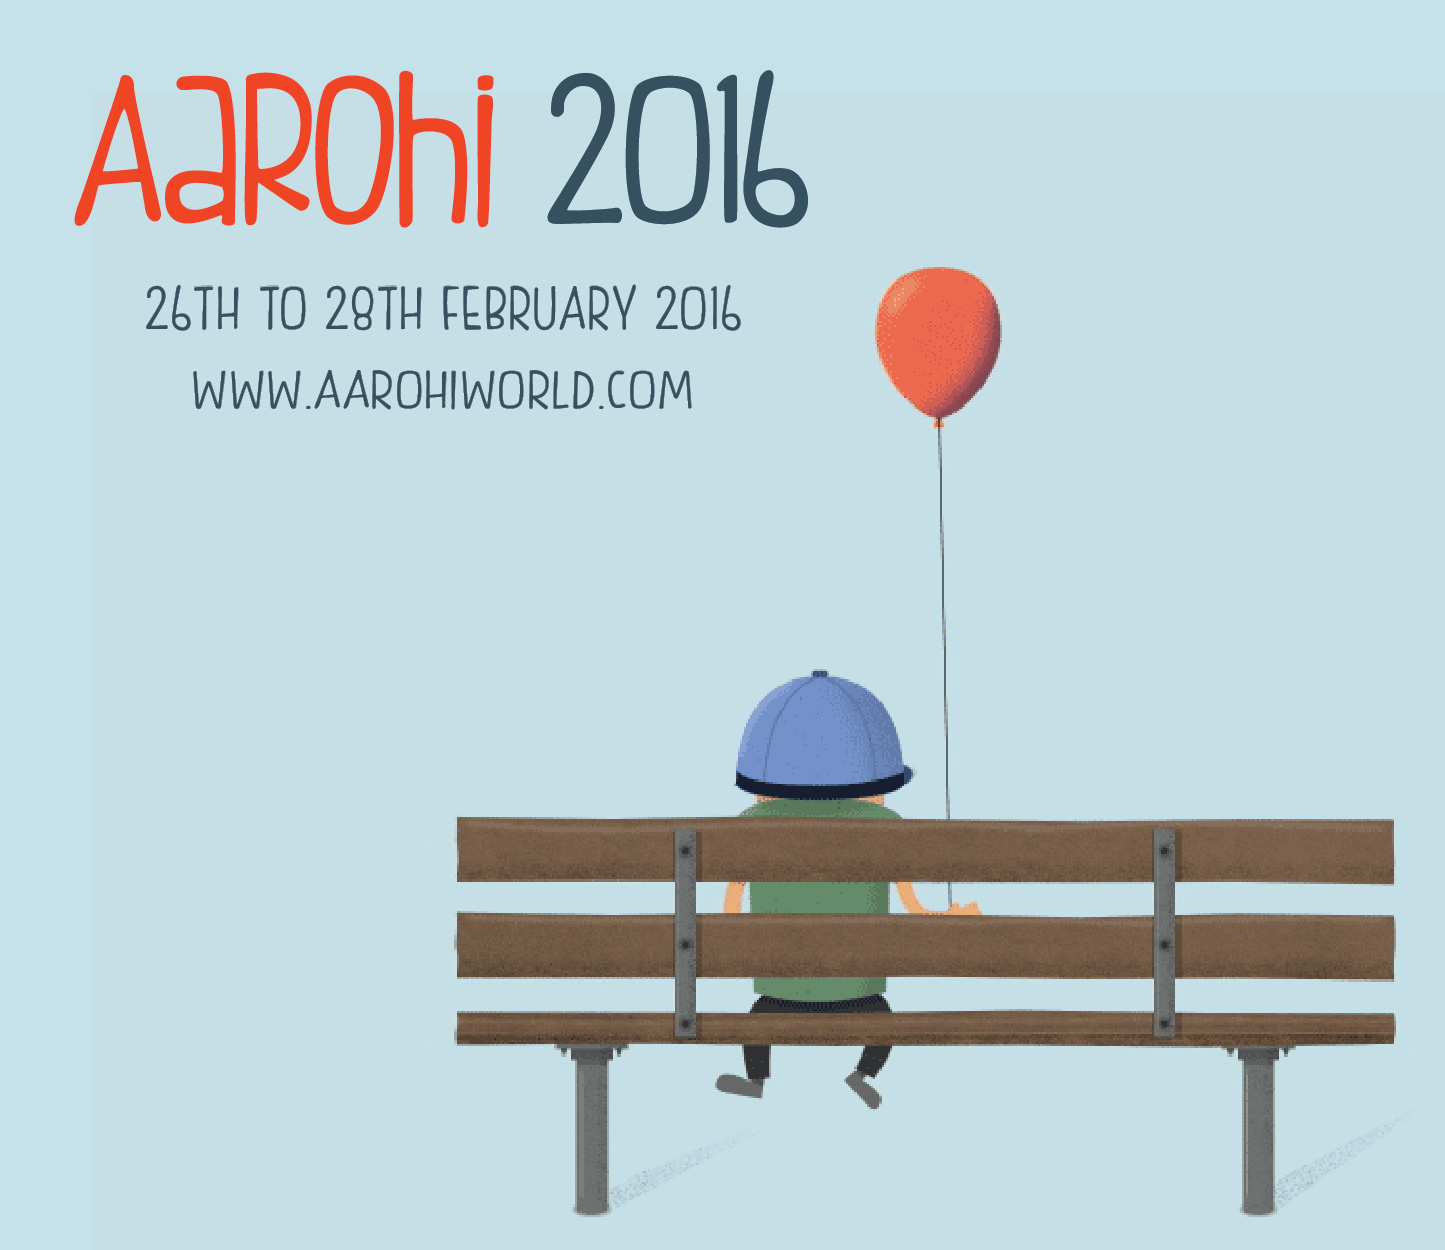 Aarohi-2016 VNIT Nagpur